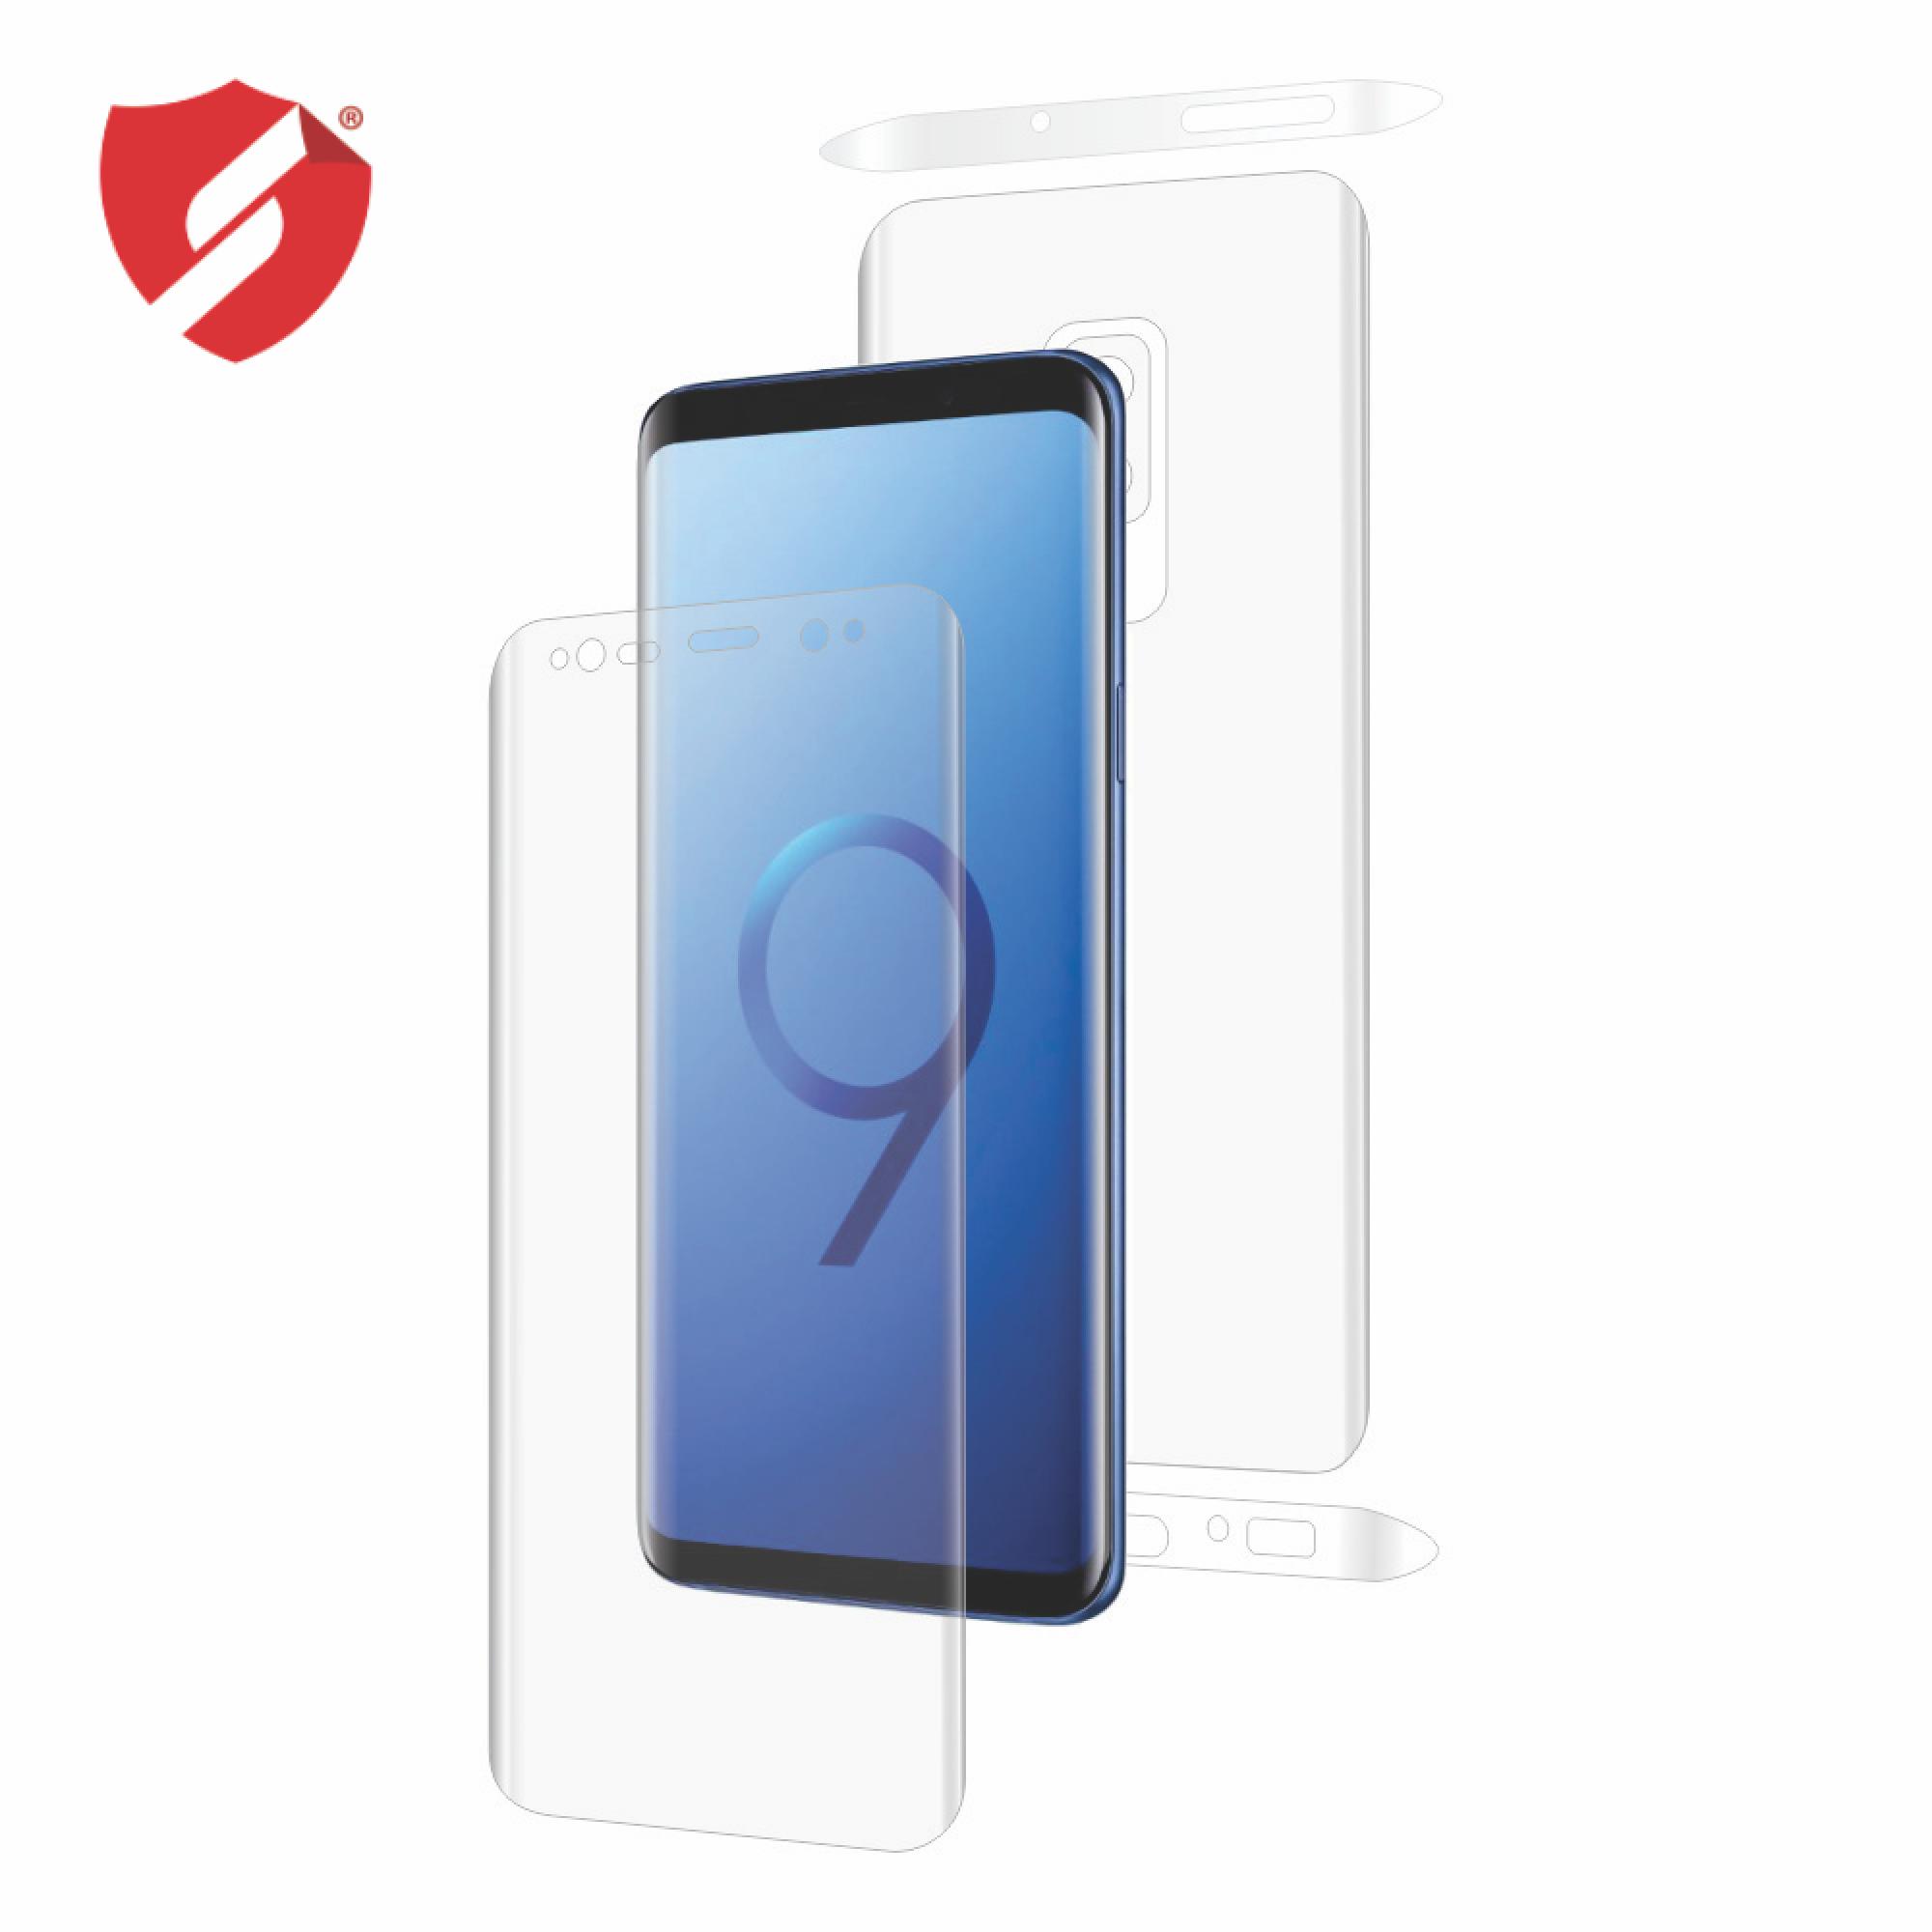 Folie de protectie Smart Protection Samsung Galaxy S9 Plus compatibila cu carcasa Hyperknit - fullbody - display + spate + laterale imagine